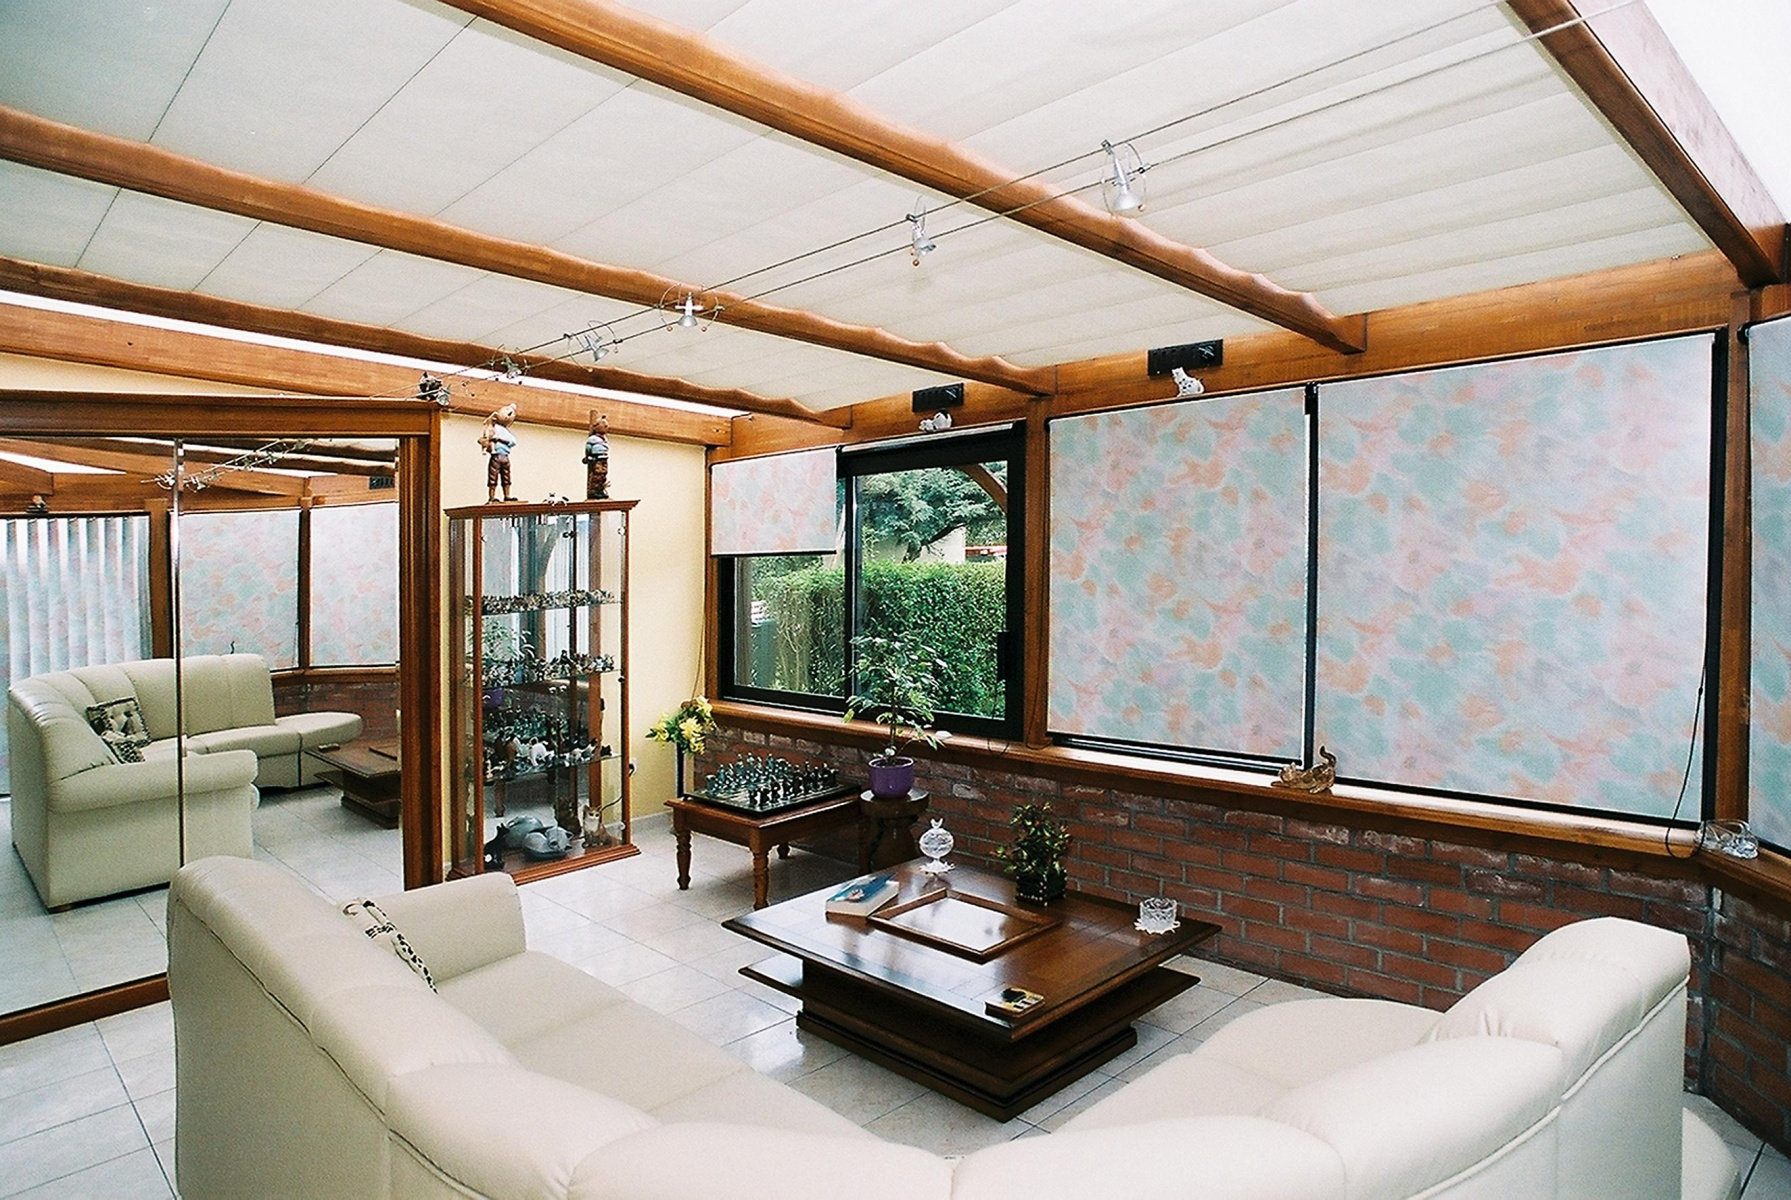 stores int rieurs store pour v randa reflex 39 sol enderlin stores et receptions. Black Bedroom Furniture Sets. Home Design Ideas